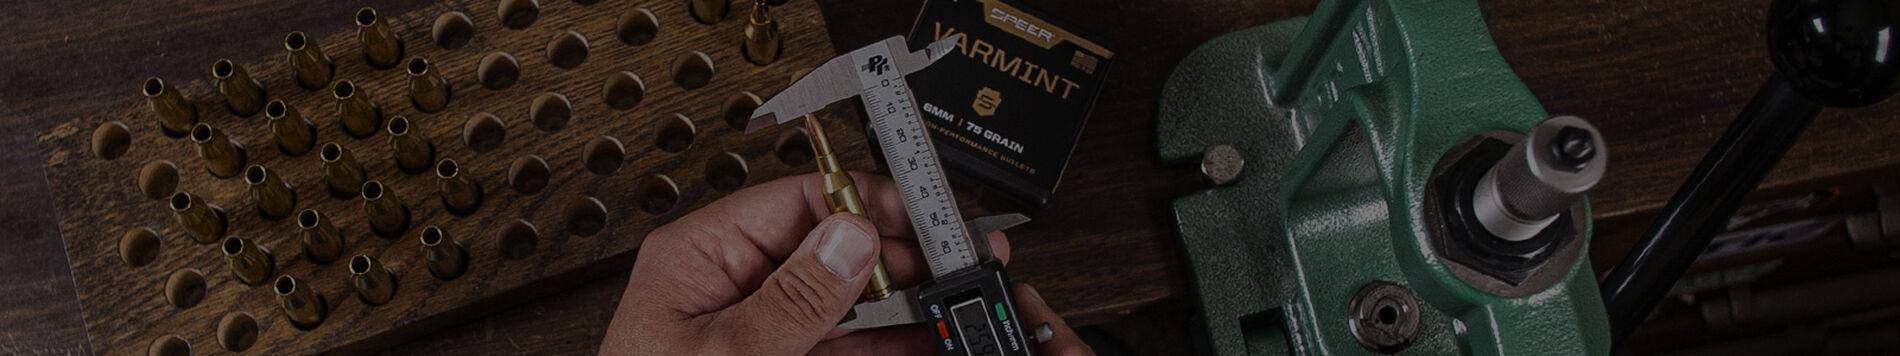 man measuring a loaded bullet